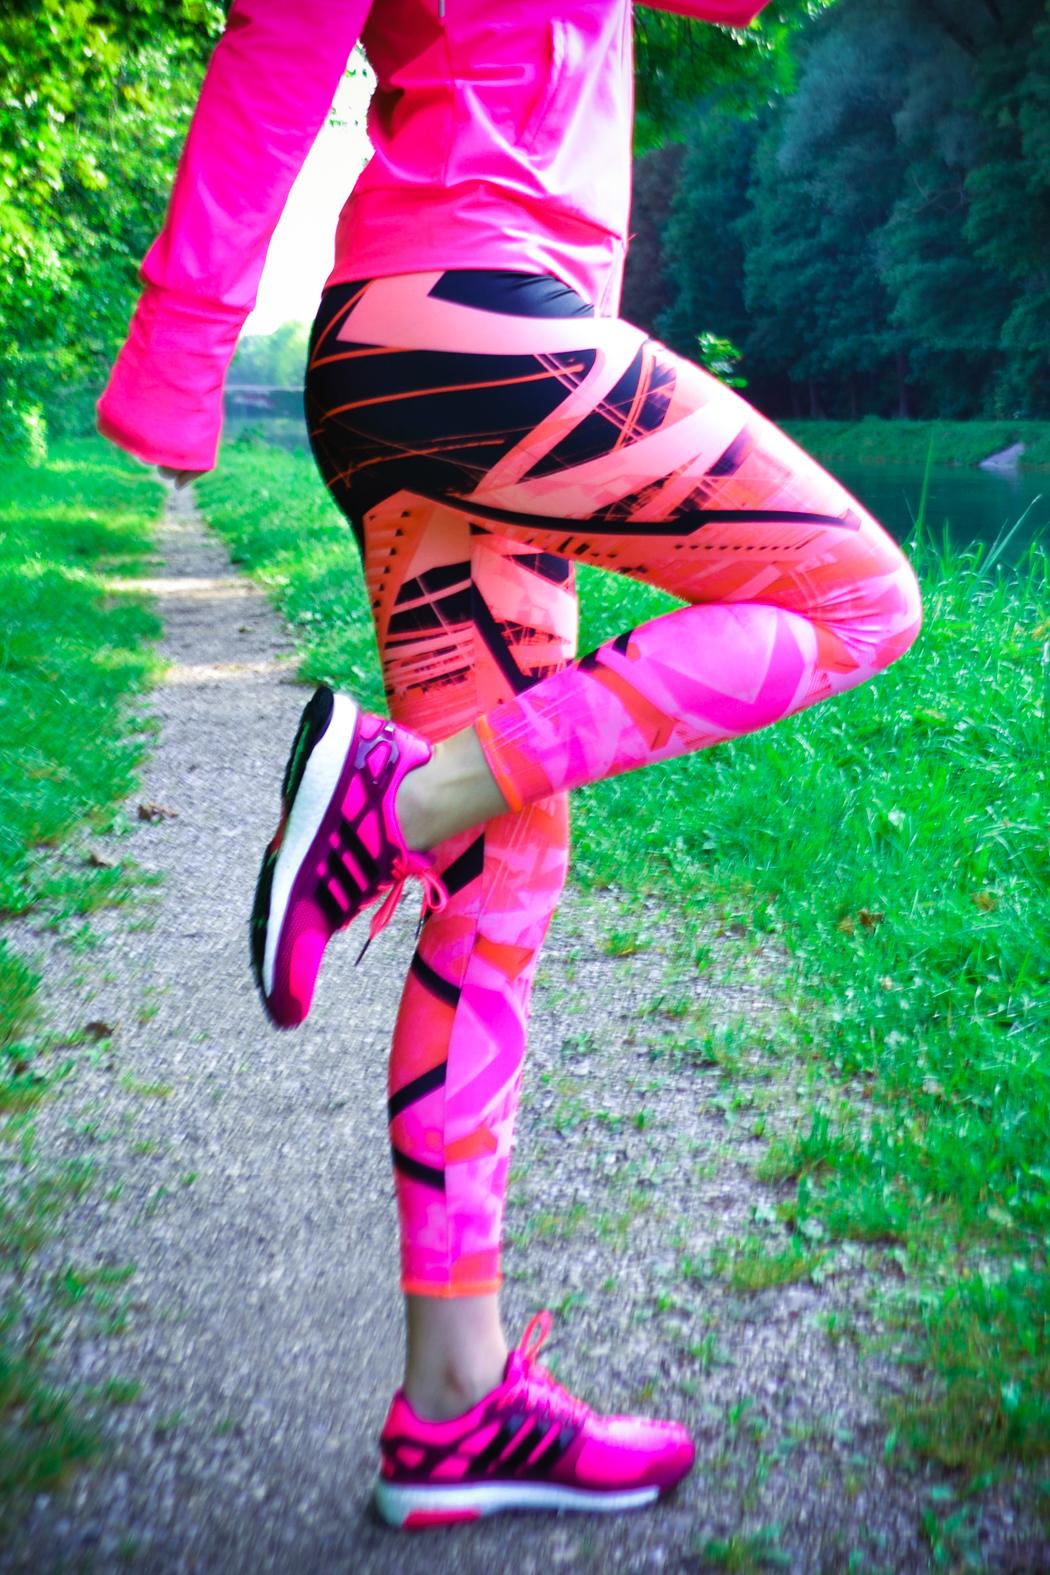 Lindarella-Fitnessblogger-Munich-München-Adidas-Boost-Laufschuhe-Pink-Sportoutfit-4